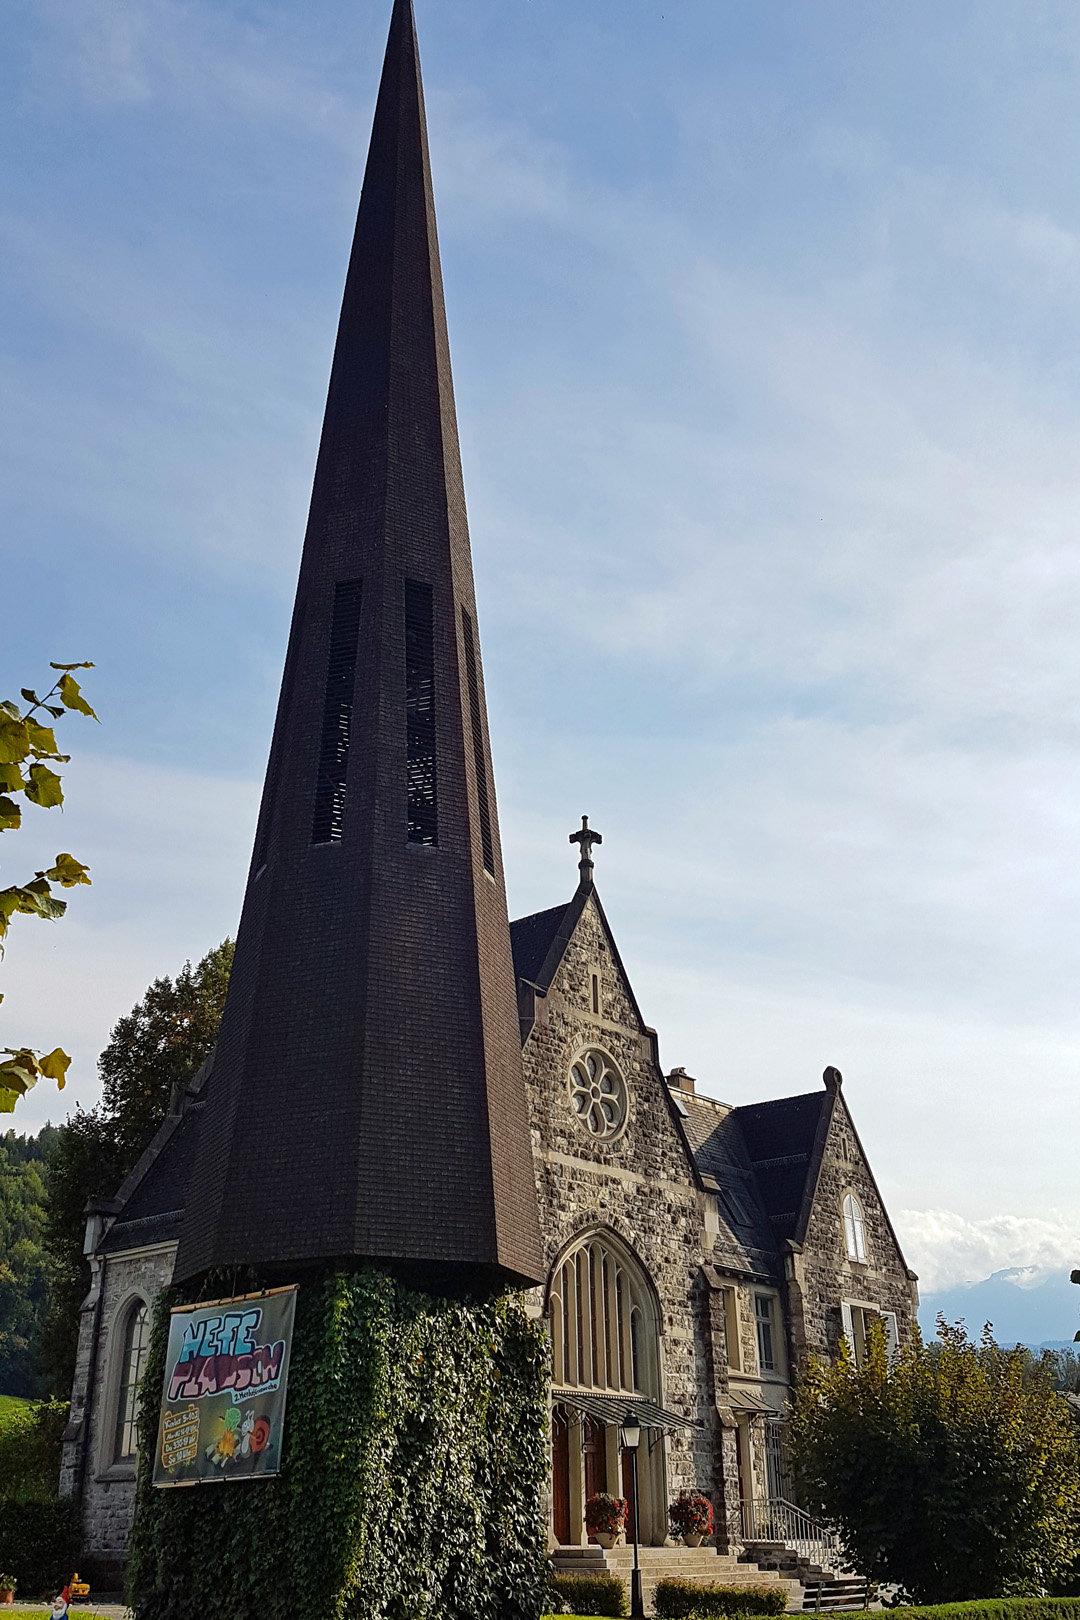 Brunnen Reformed Church